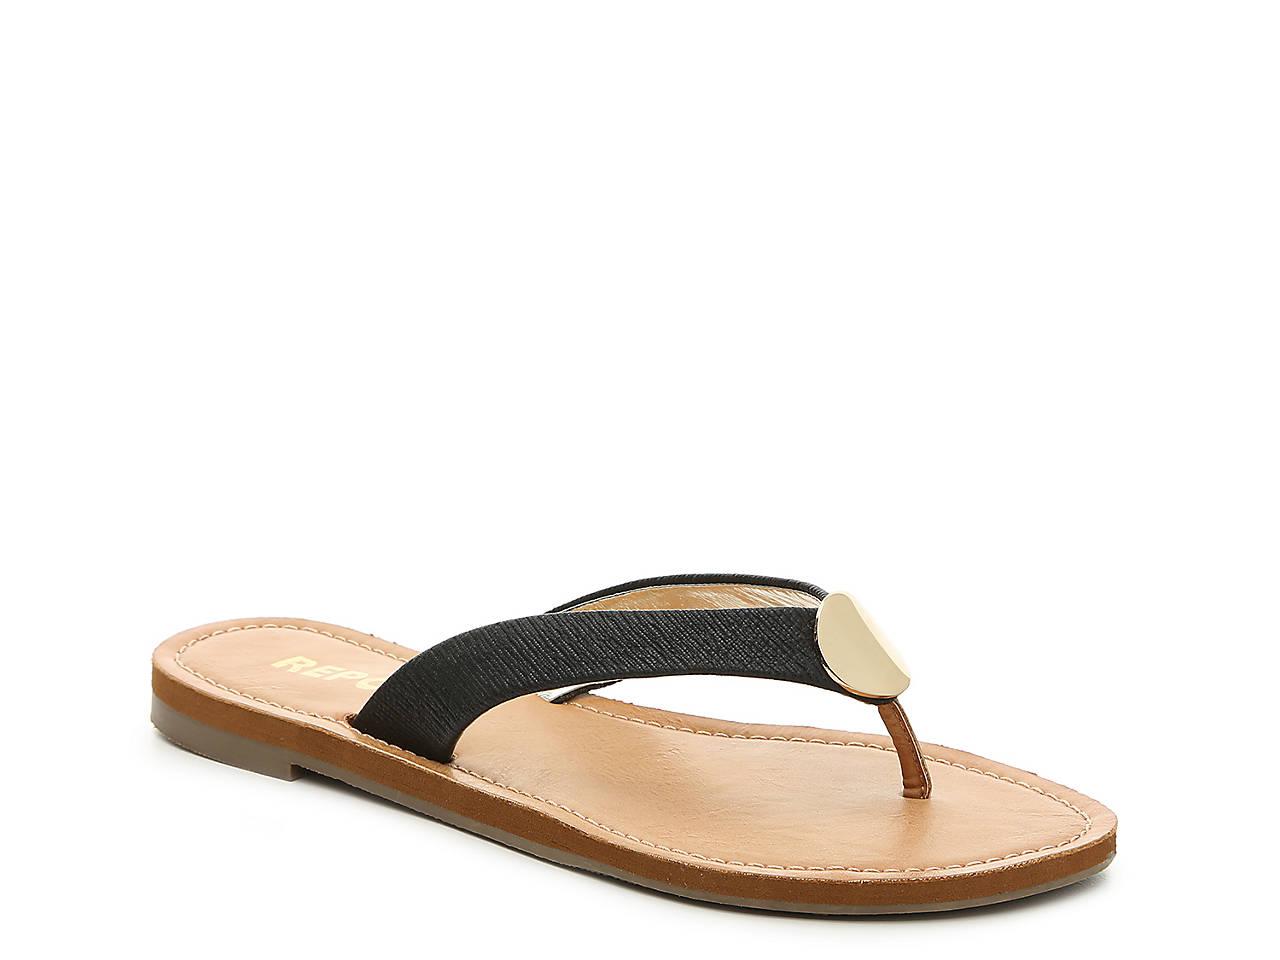 8987cb667 Report Seville Flat Sandal Women s Shoes